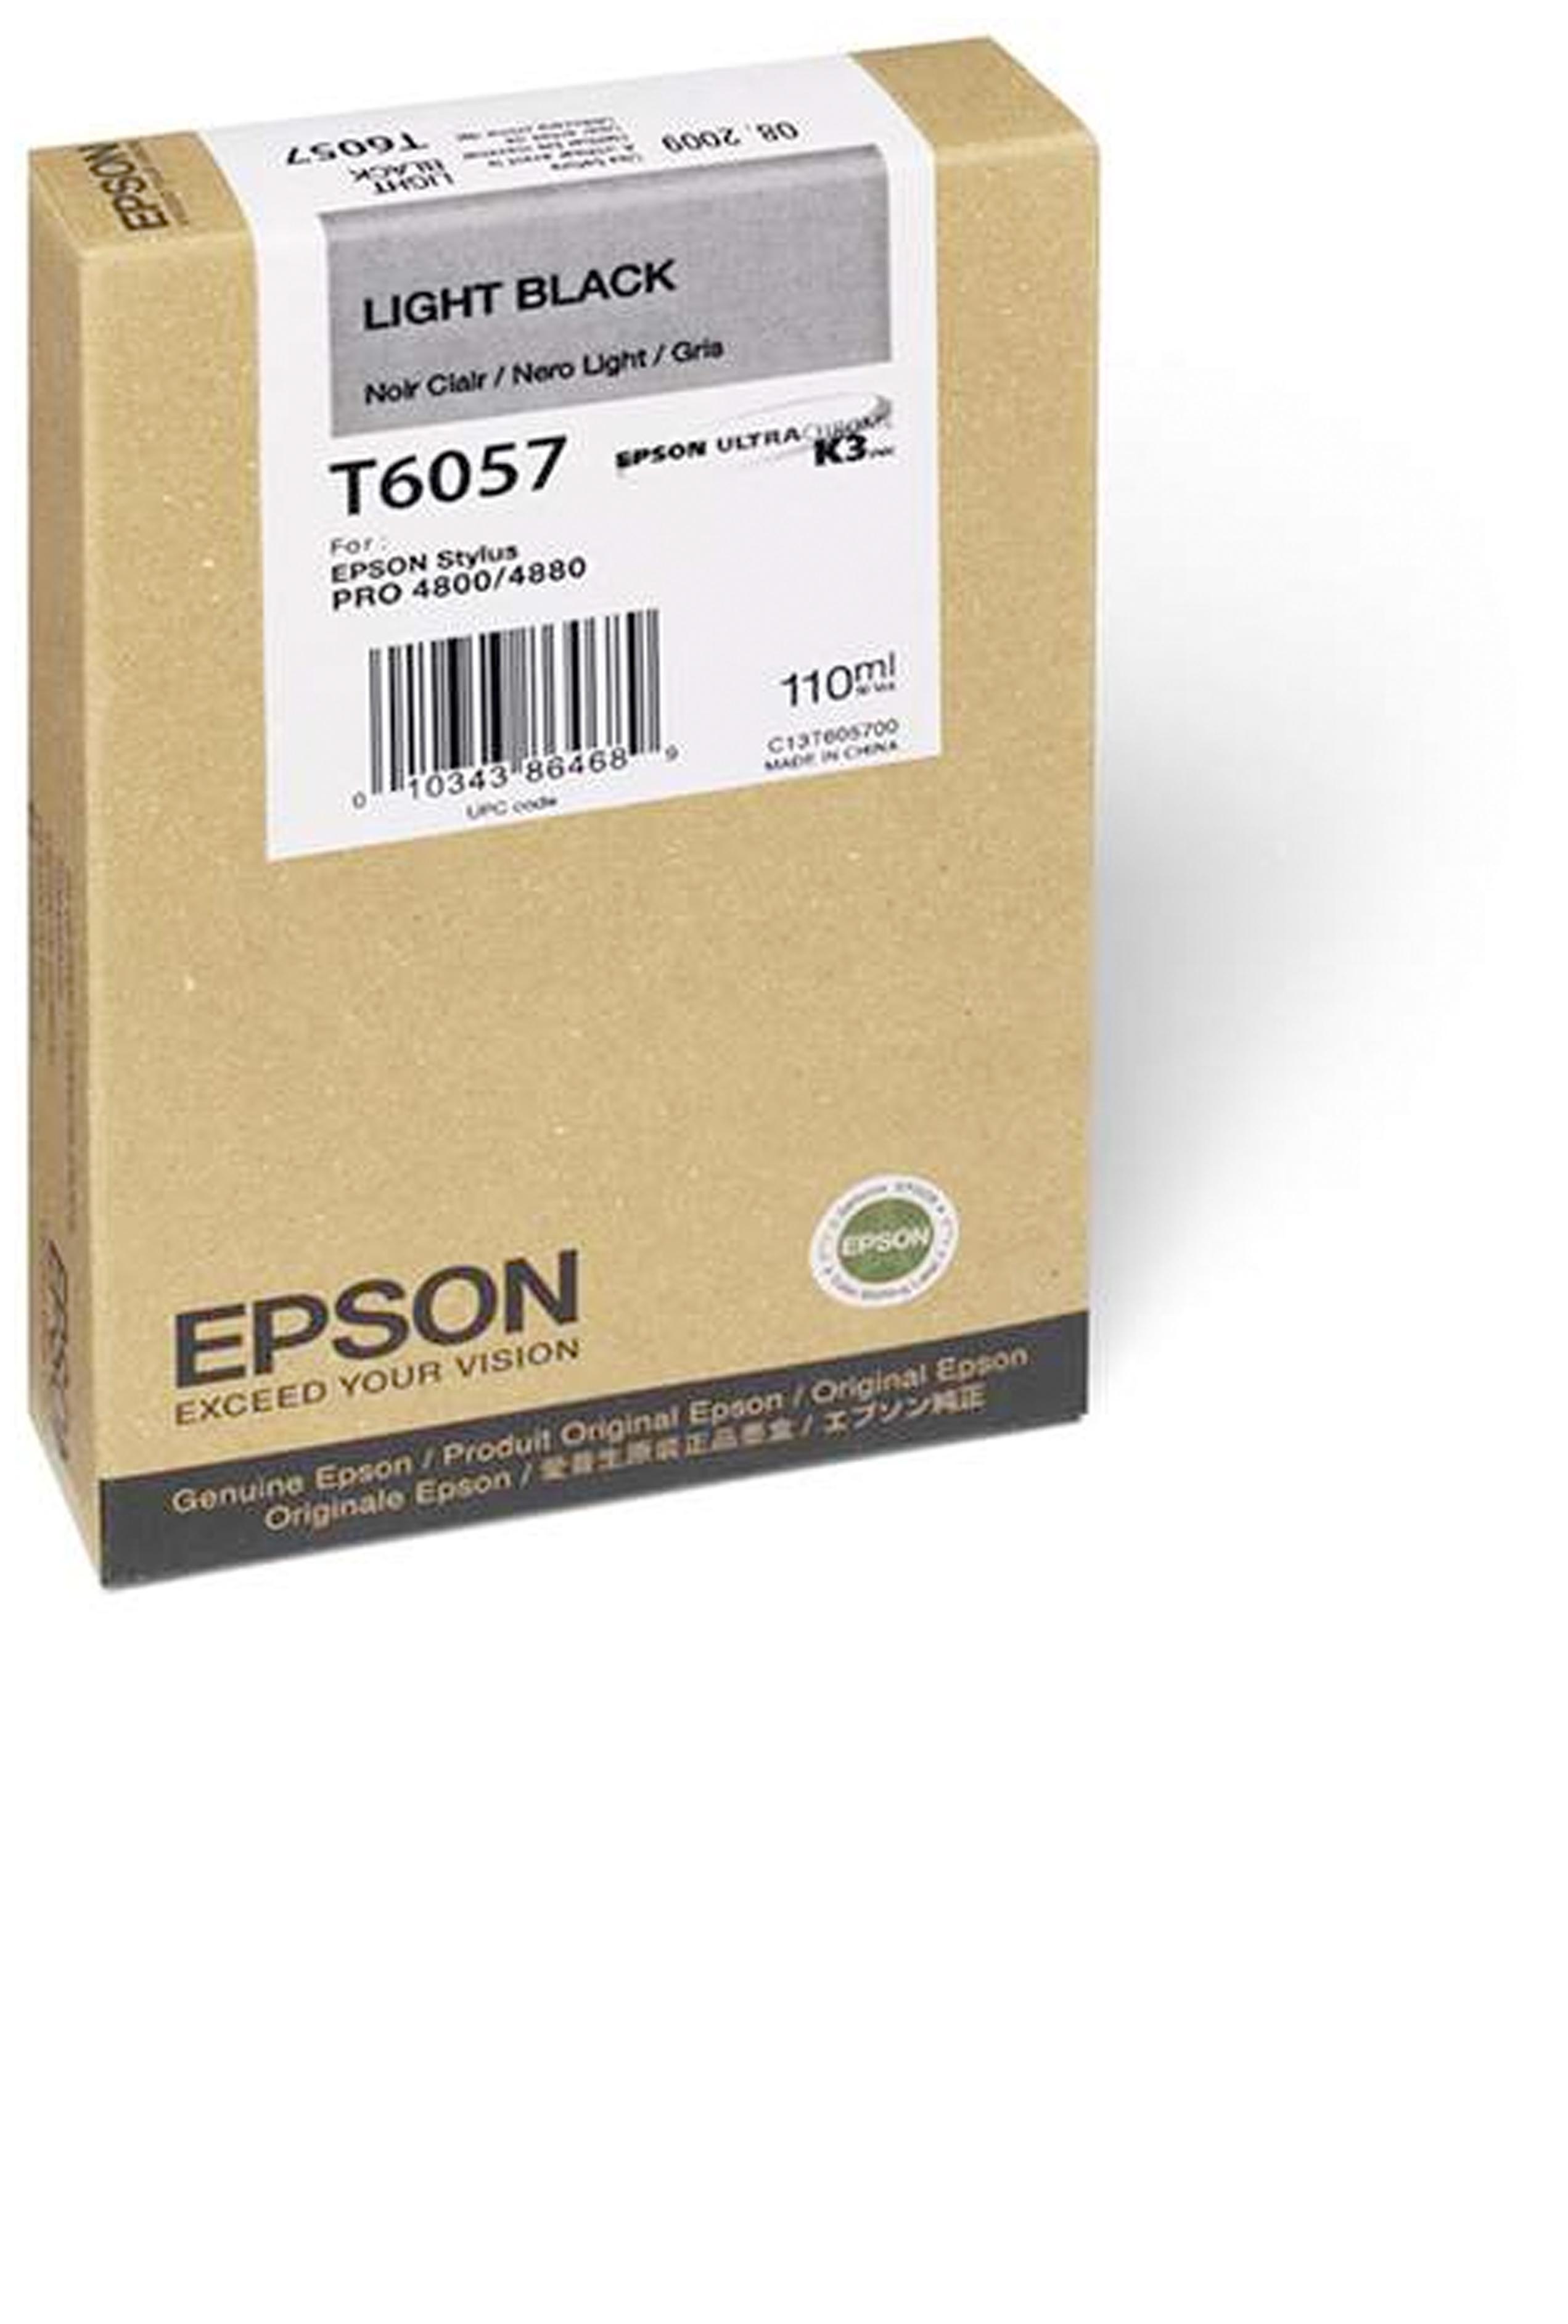 Epson EPSON SD LT BLACK INK (110 ML) (T605700)